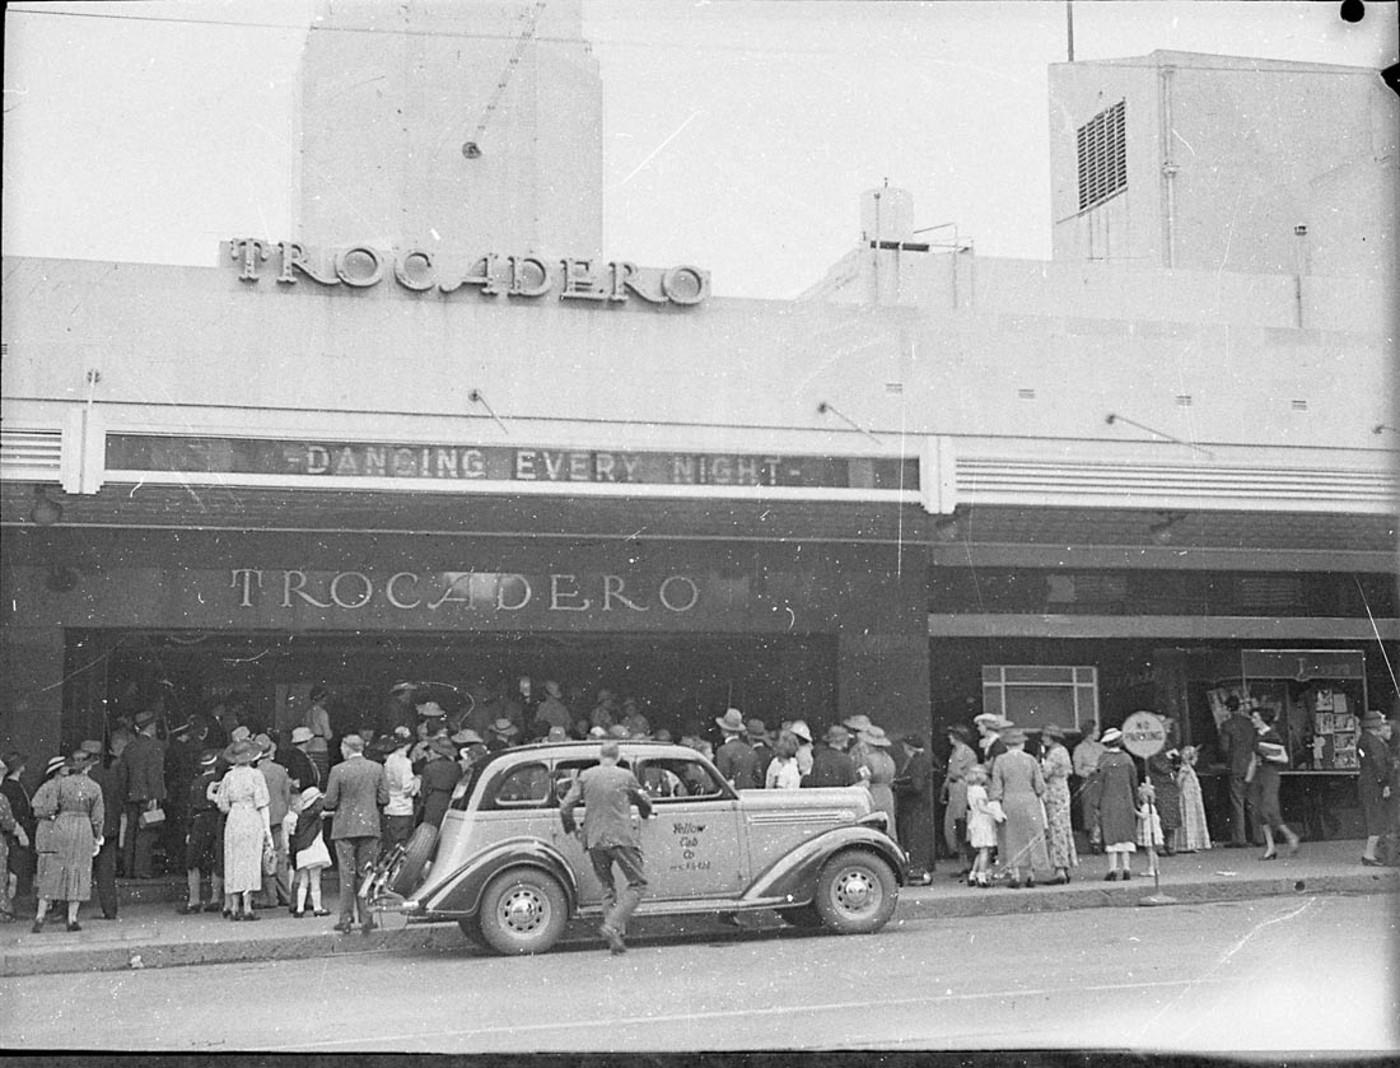 The Trocadero: Sydney's most glamorous dance hall